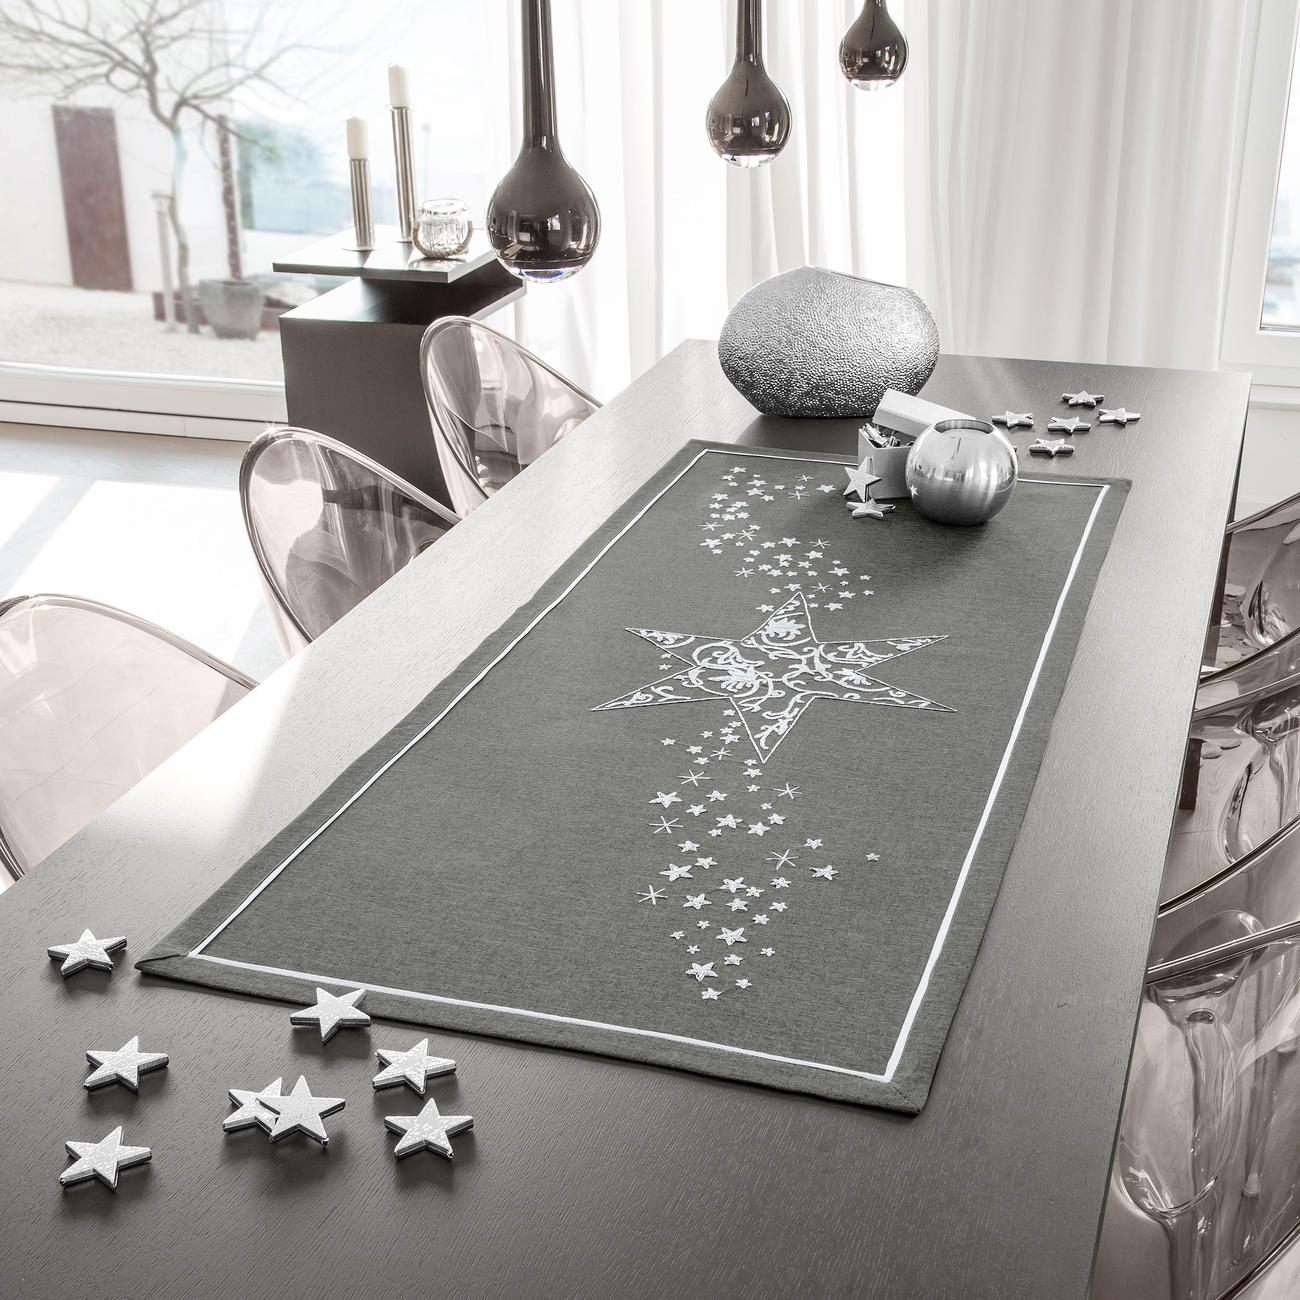 tischband l ufer oder decke weihnachtsmotive. Black Bedroom Furniture Sets. Home Design Ideas